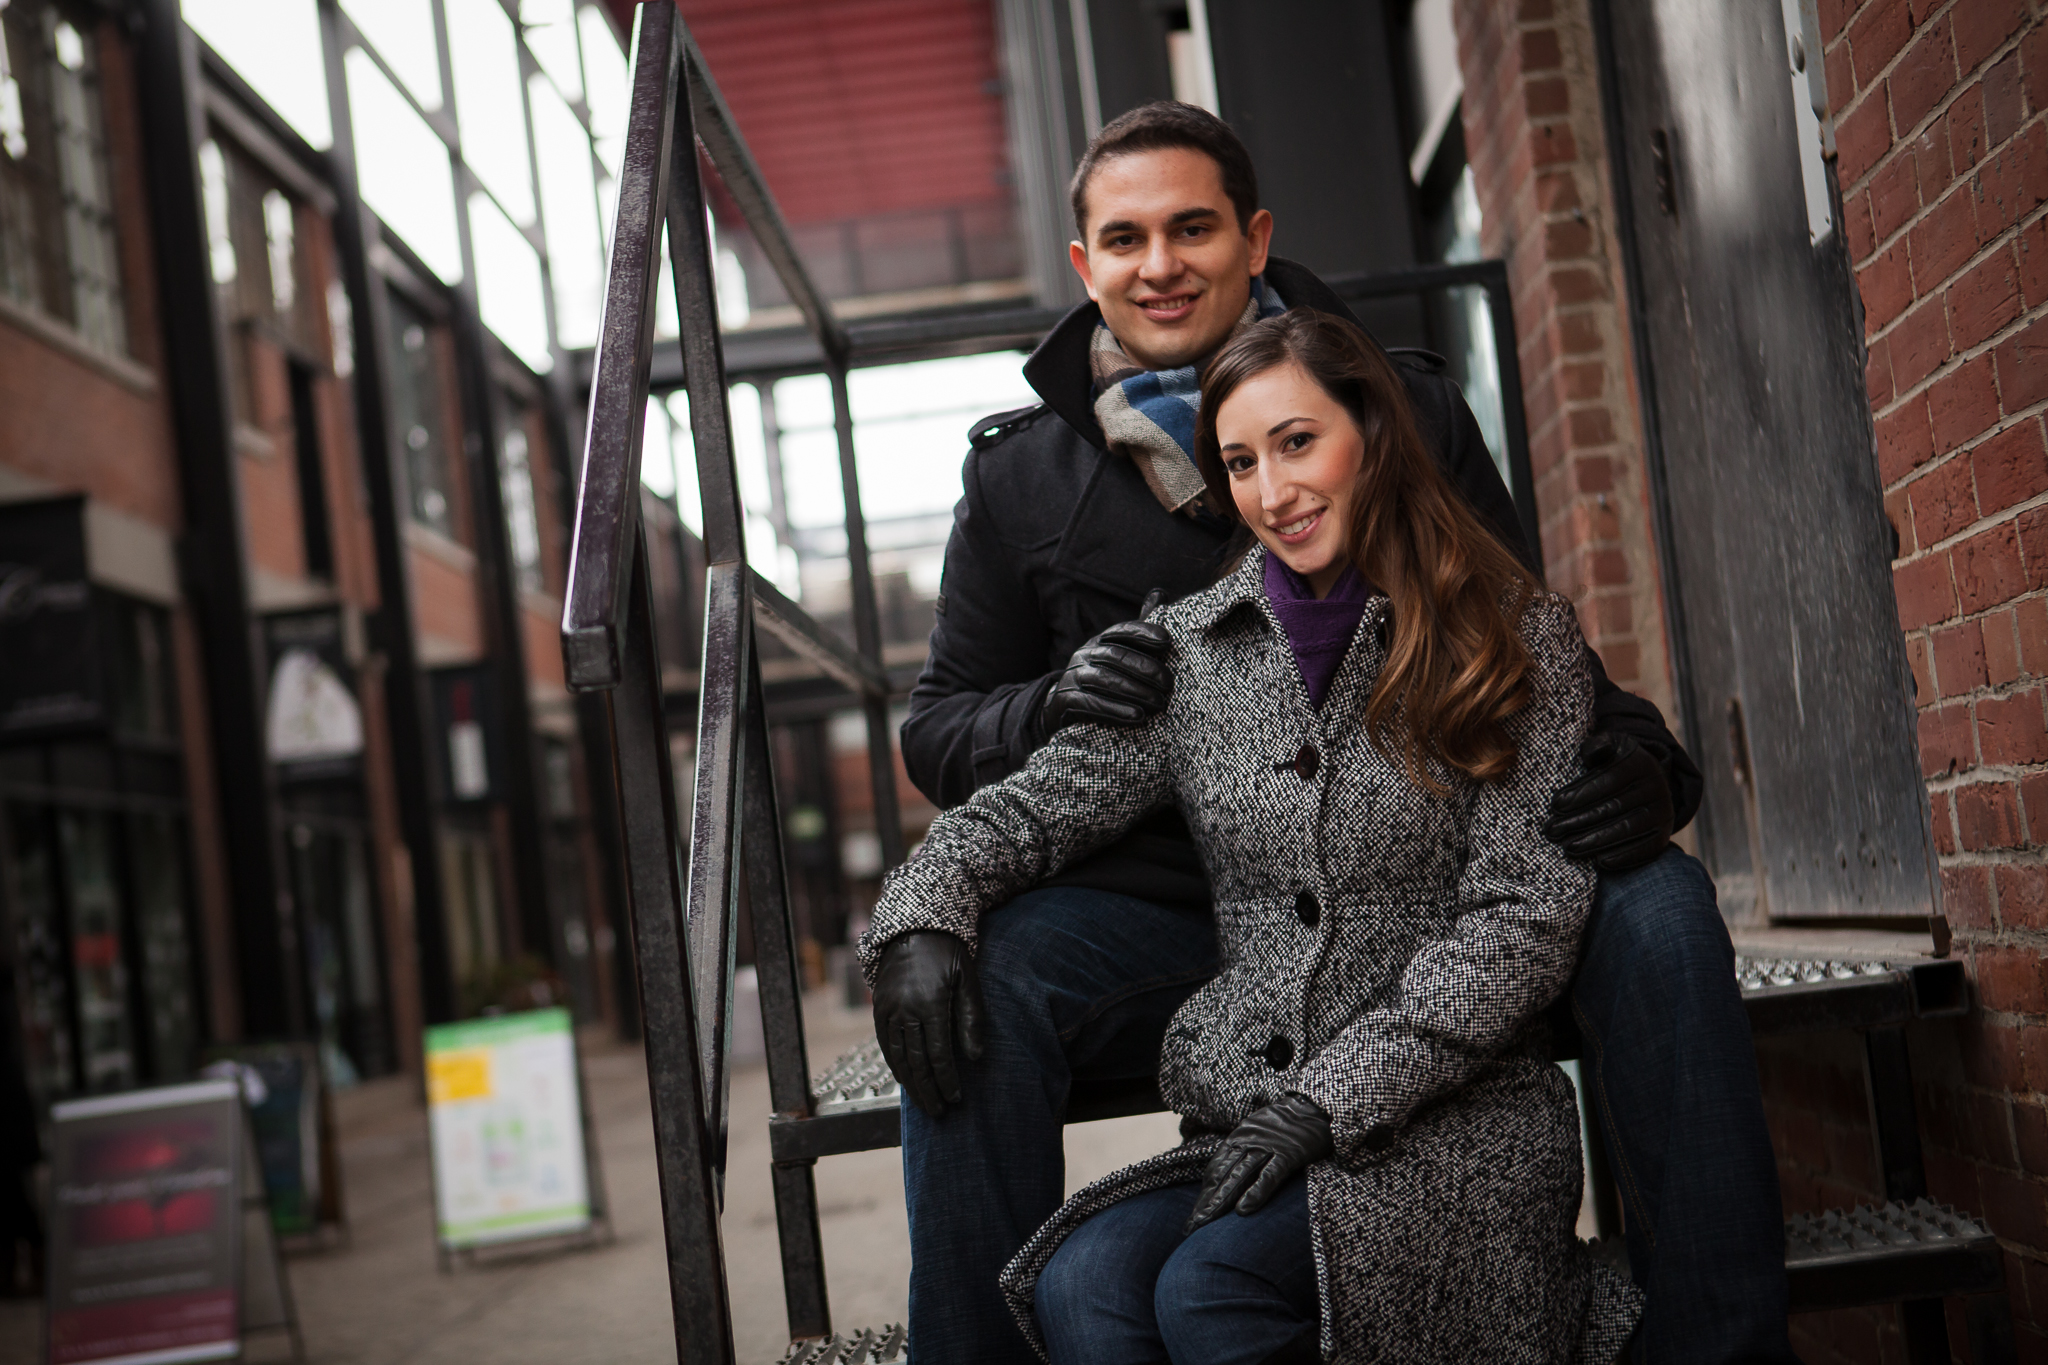 Toronto Wedding Photography - Kristina & Gabe Esession-11.jpg